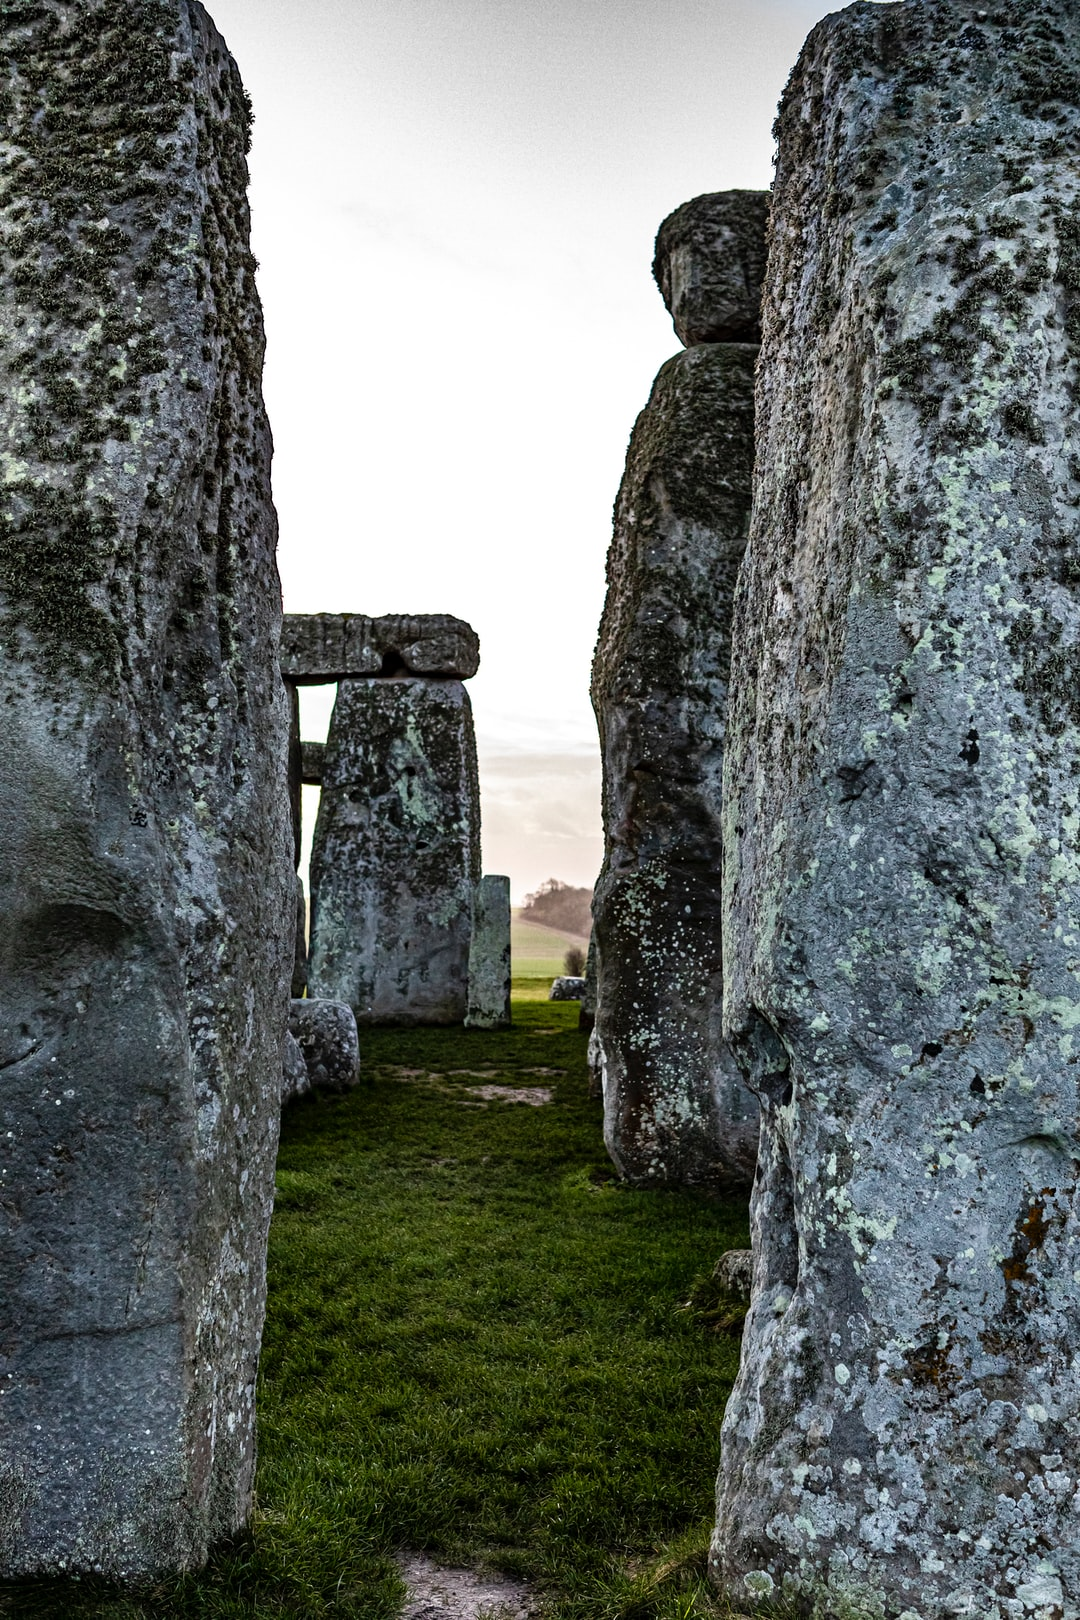 Prehistorical heritage site, cirle of monliths, Stonehenge, England, UK, February 2020.